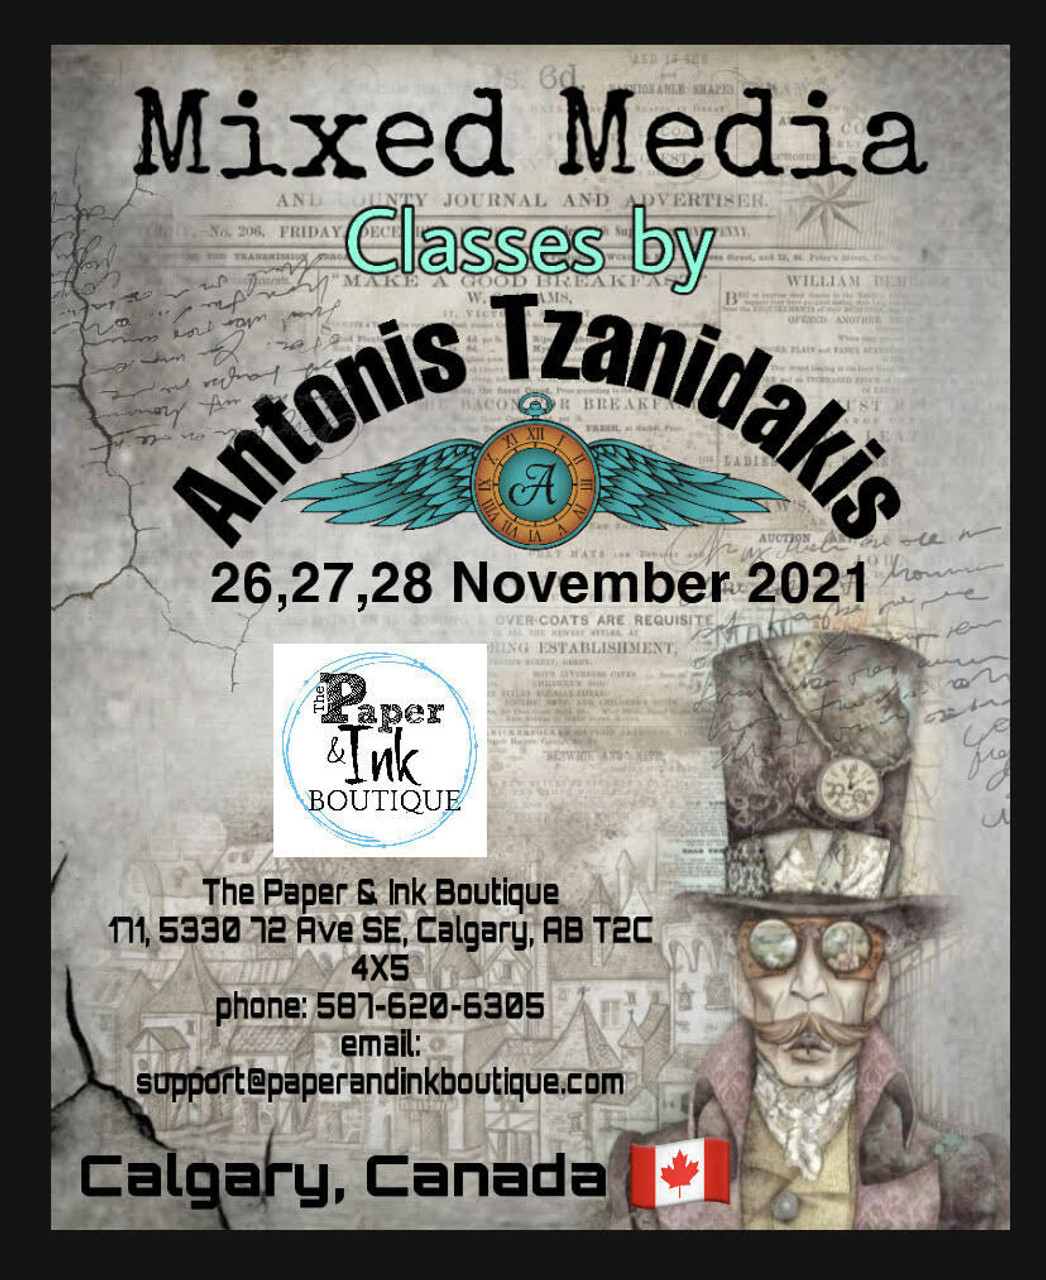 Antonis Tzanidakis Workshops